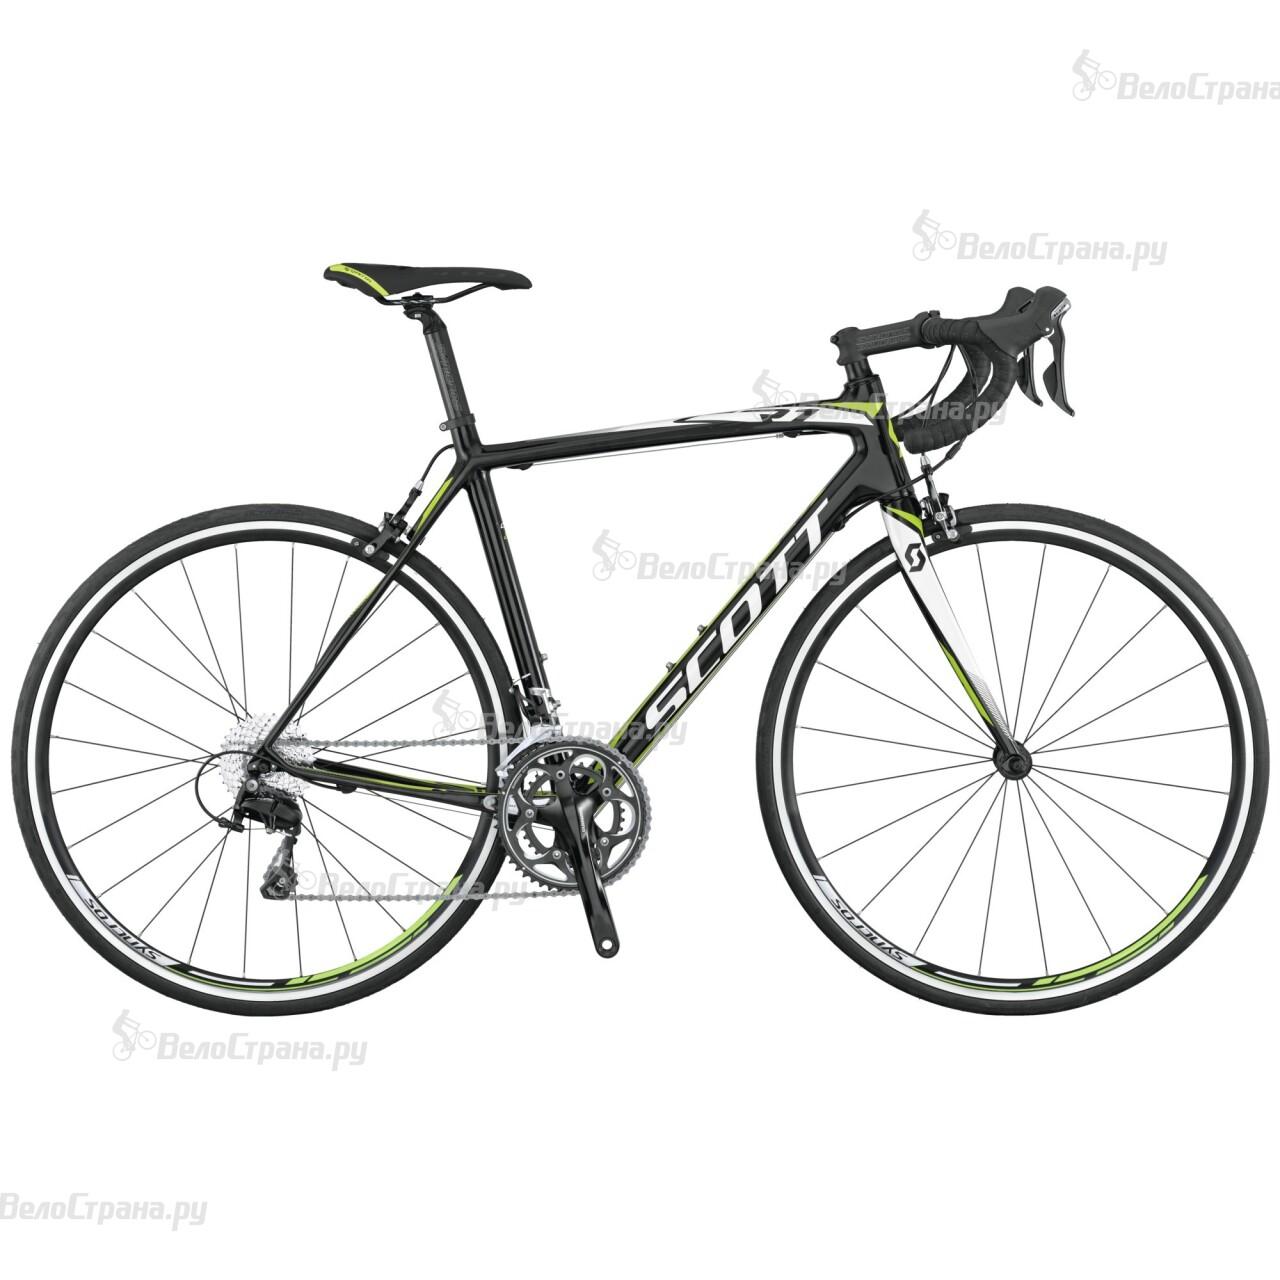 Велосипед Scott CR1 20 (2015)